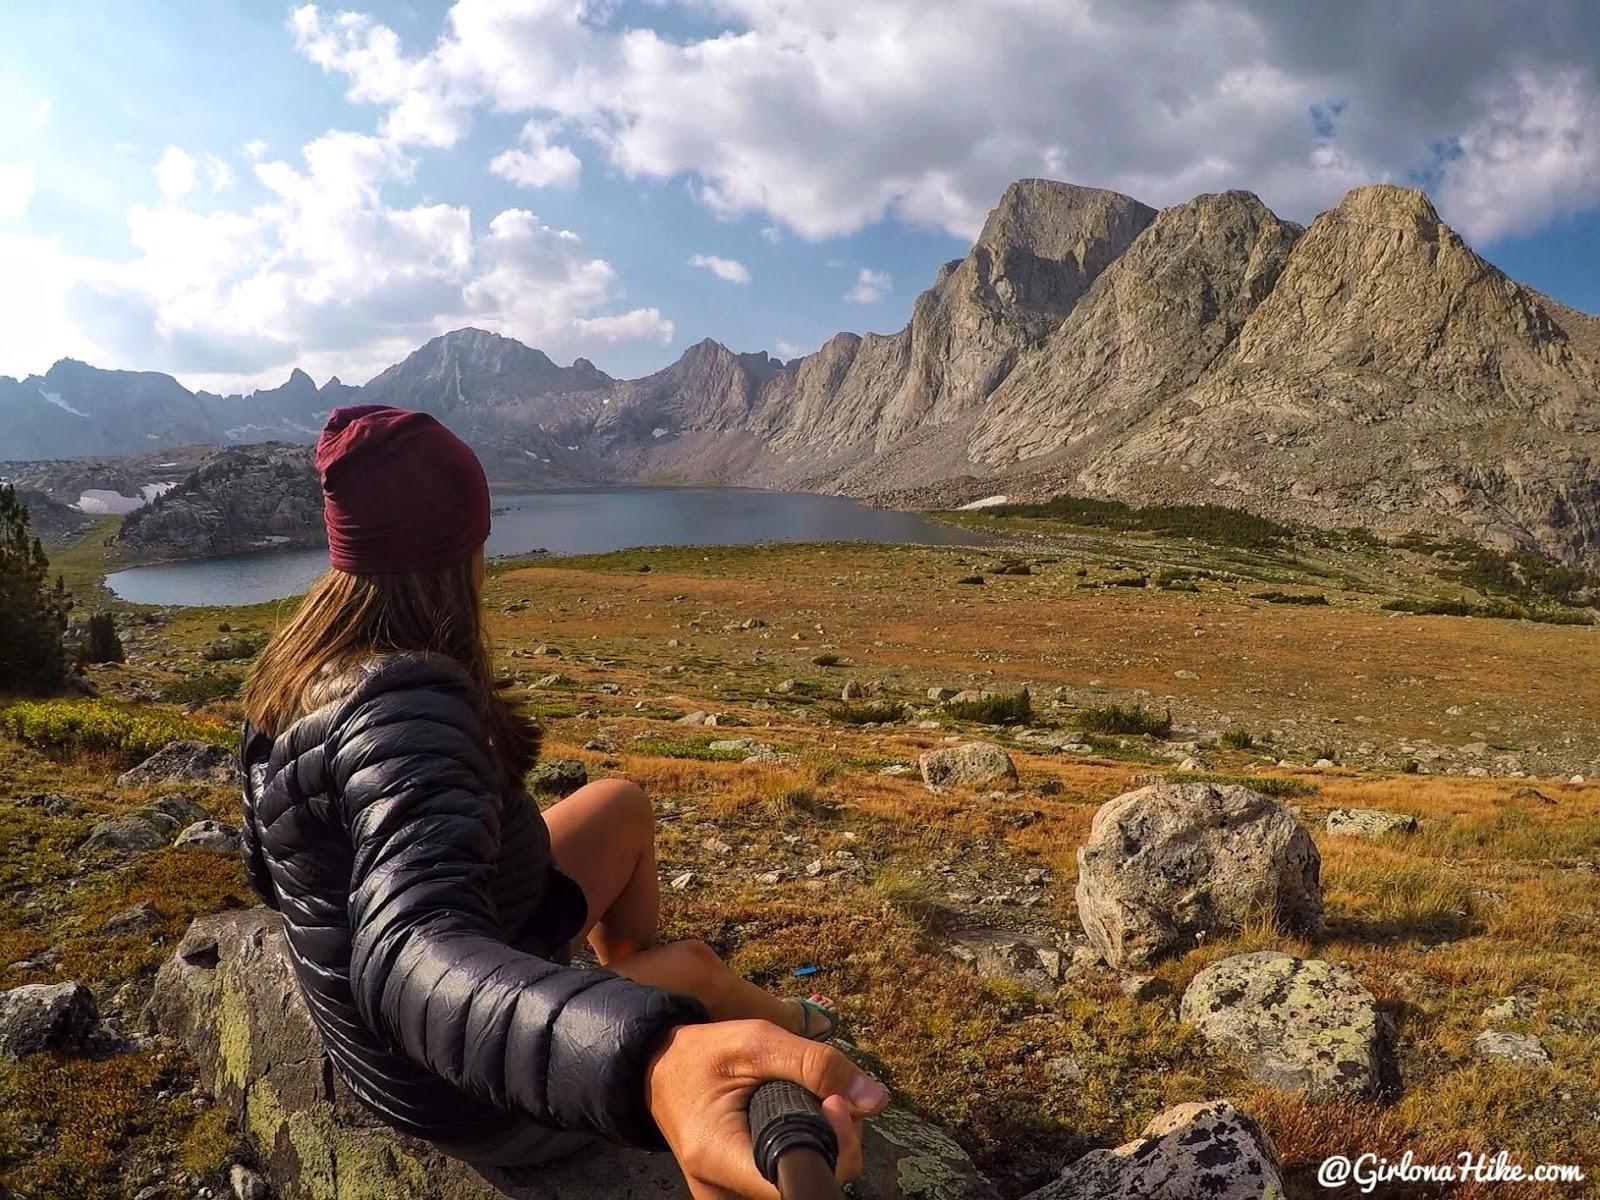 Backpacking to Mt. Hooker & Baptiste Lake, Wind River Range, Musembeah Peak